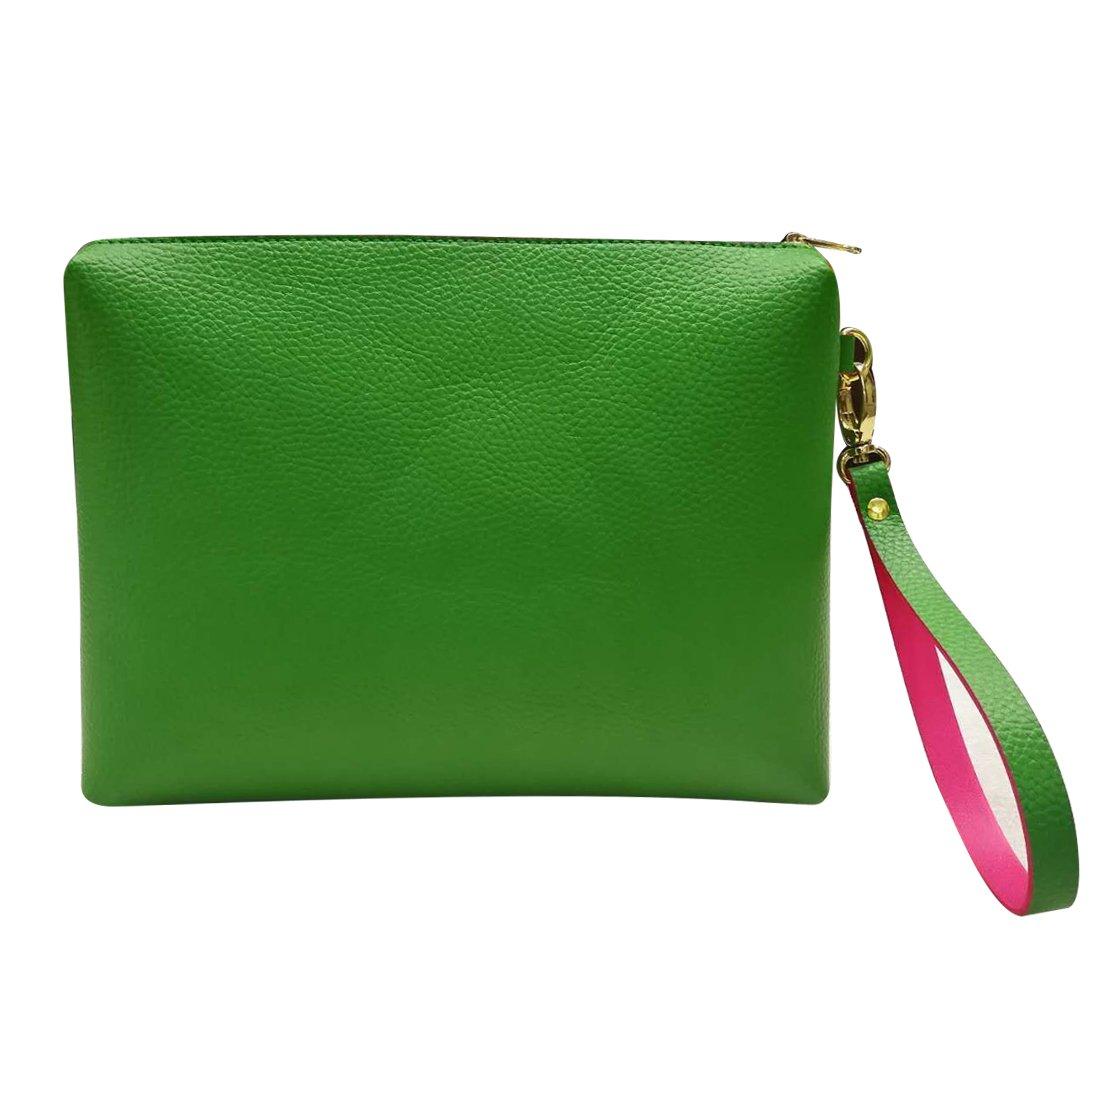 Women's Clutch Bag Leather Wristlet Evening Handbag Large Capacity Makeup Bag & Cosmetic Bag Wallet (Green)